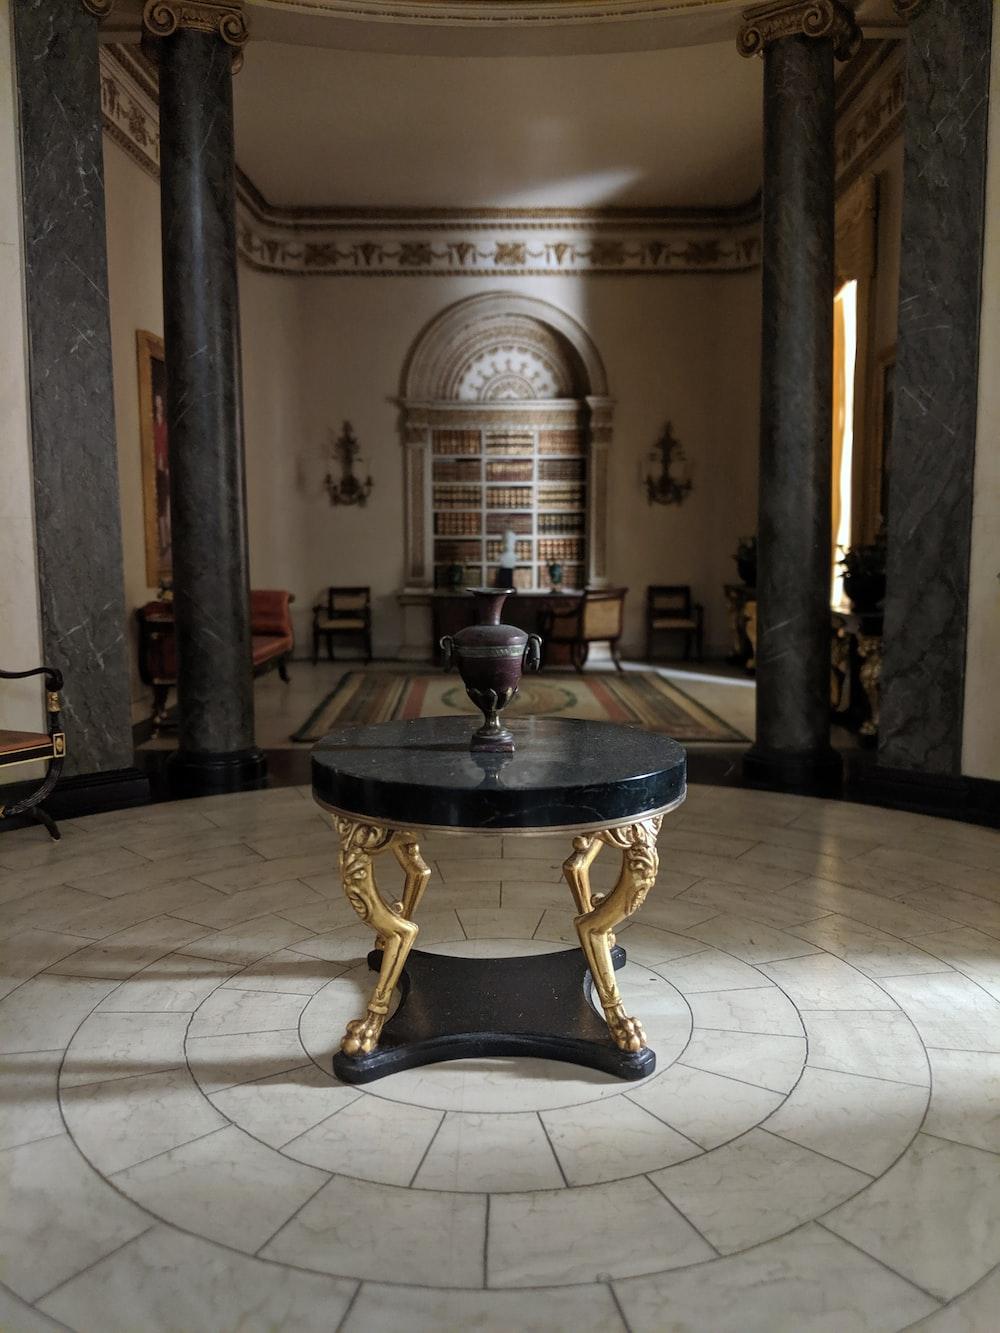 brown vase on round black marble centerpiece table